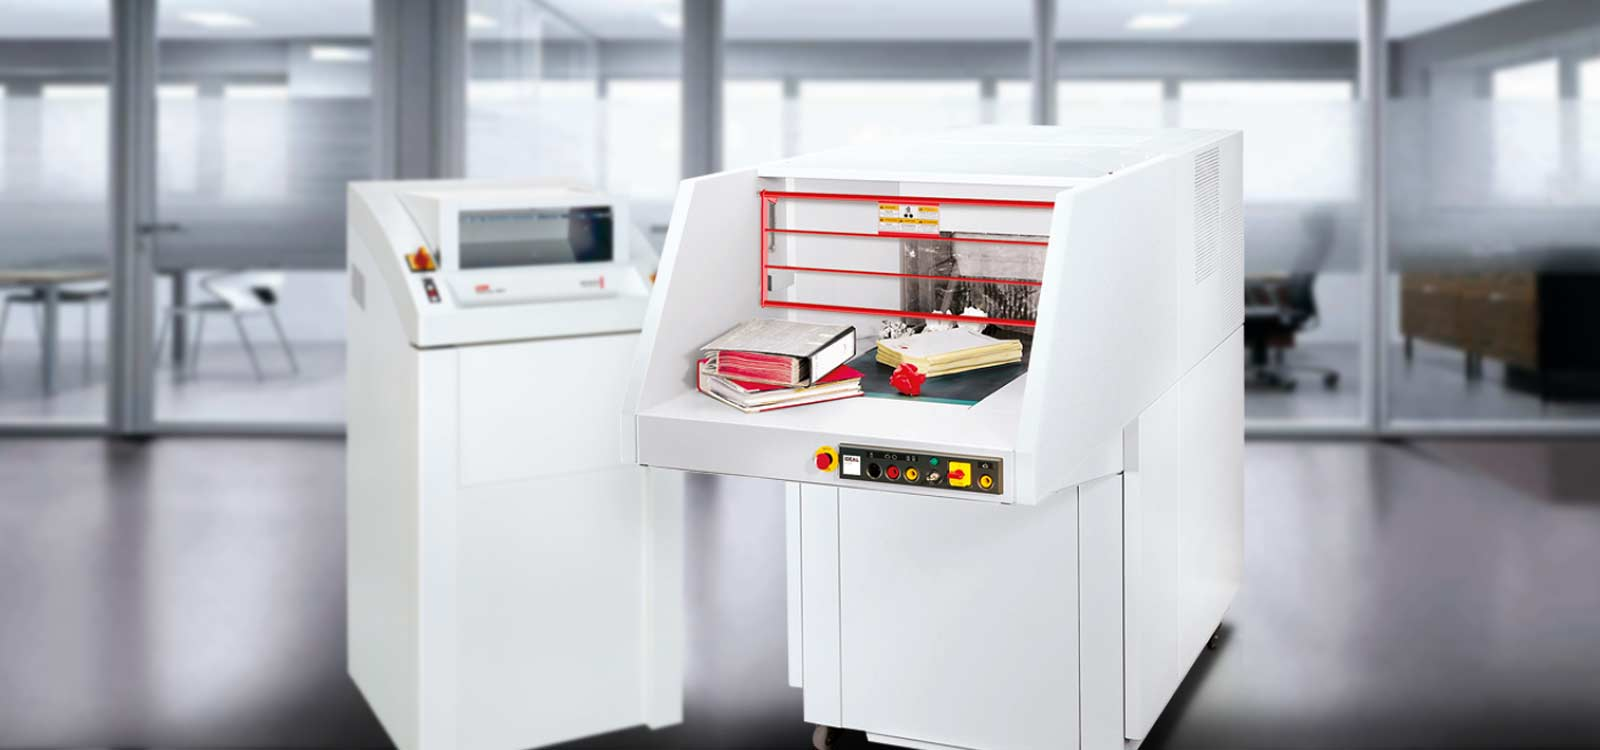 industrial-paper-shredder-heavy-duty